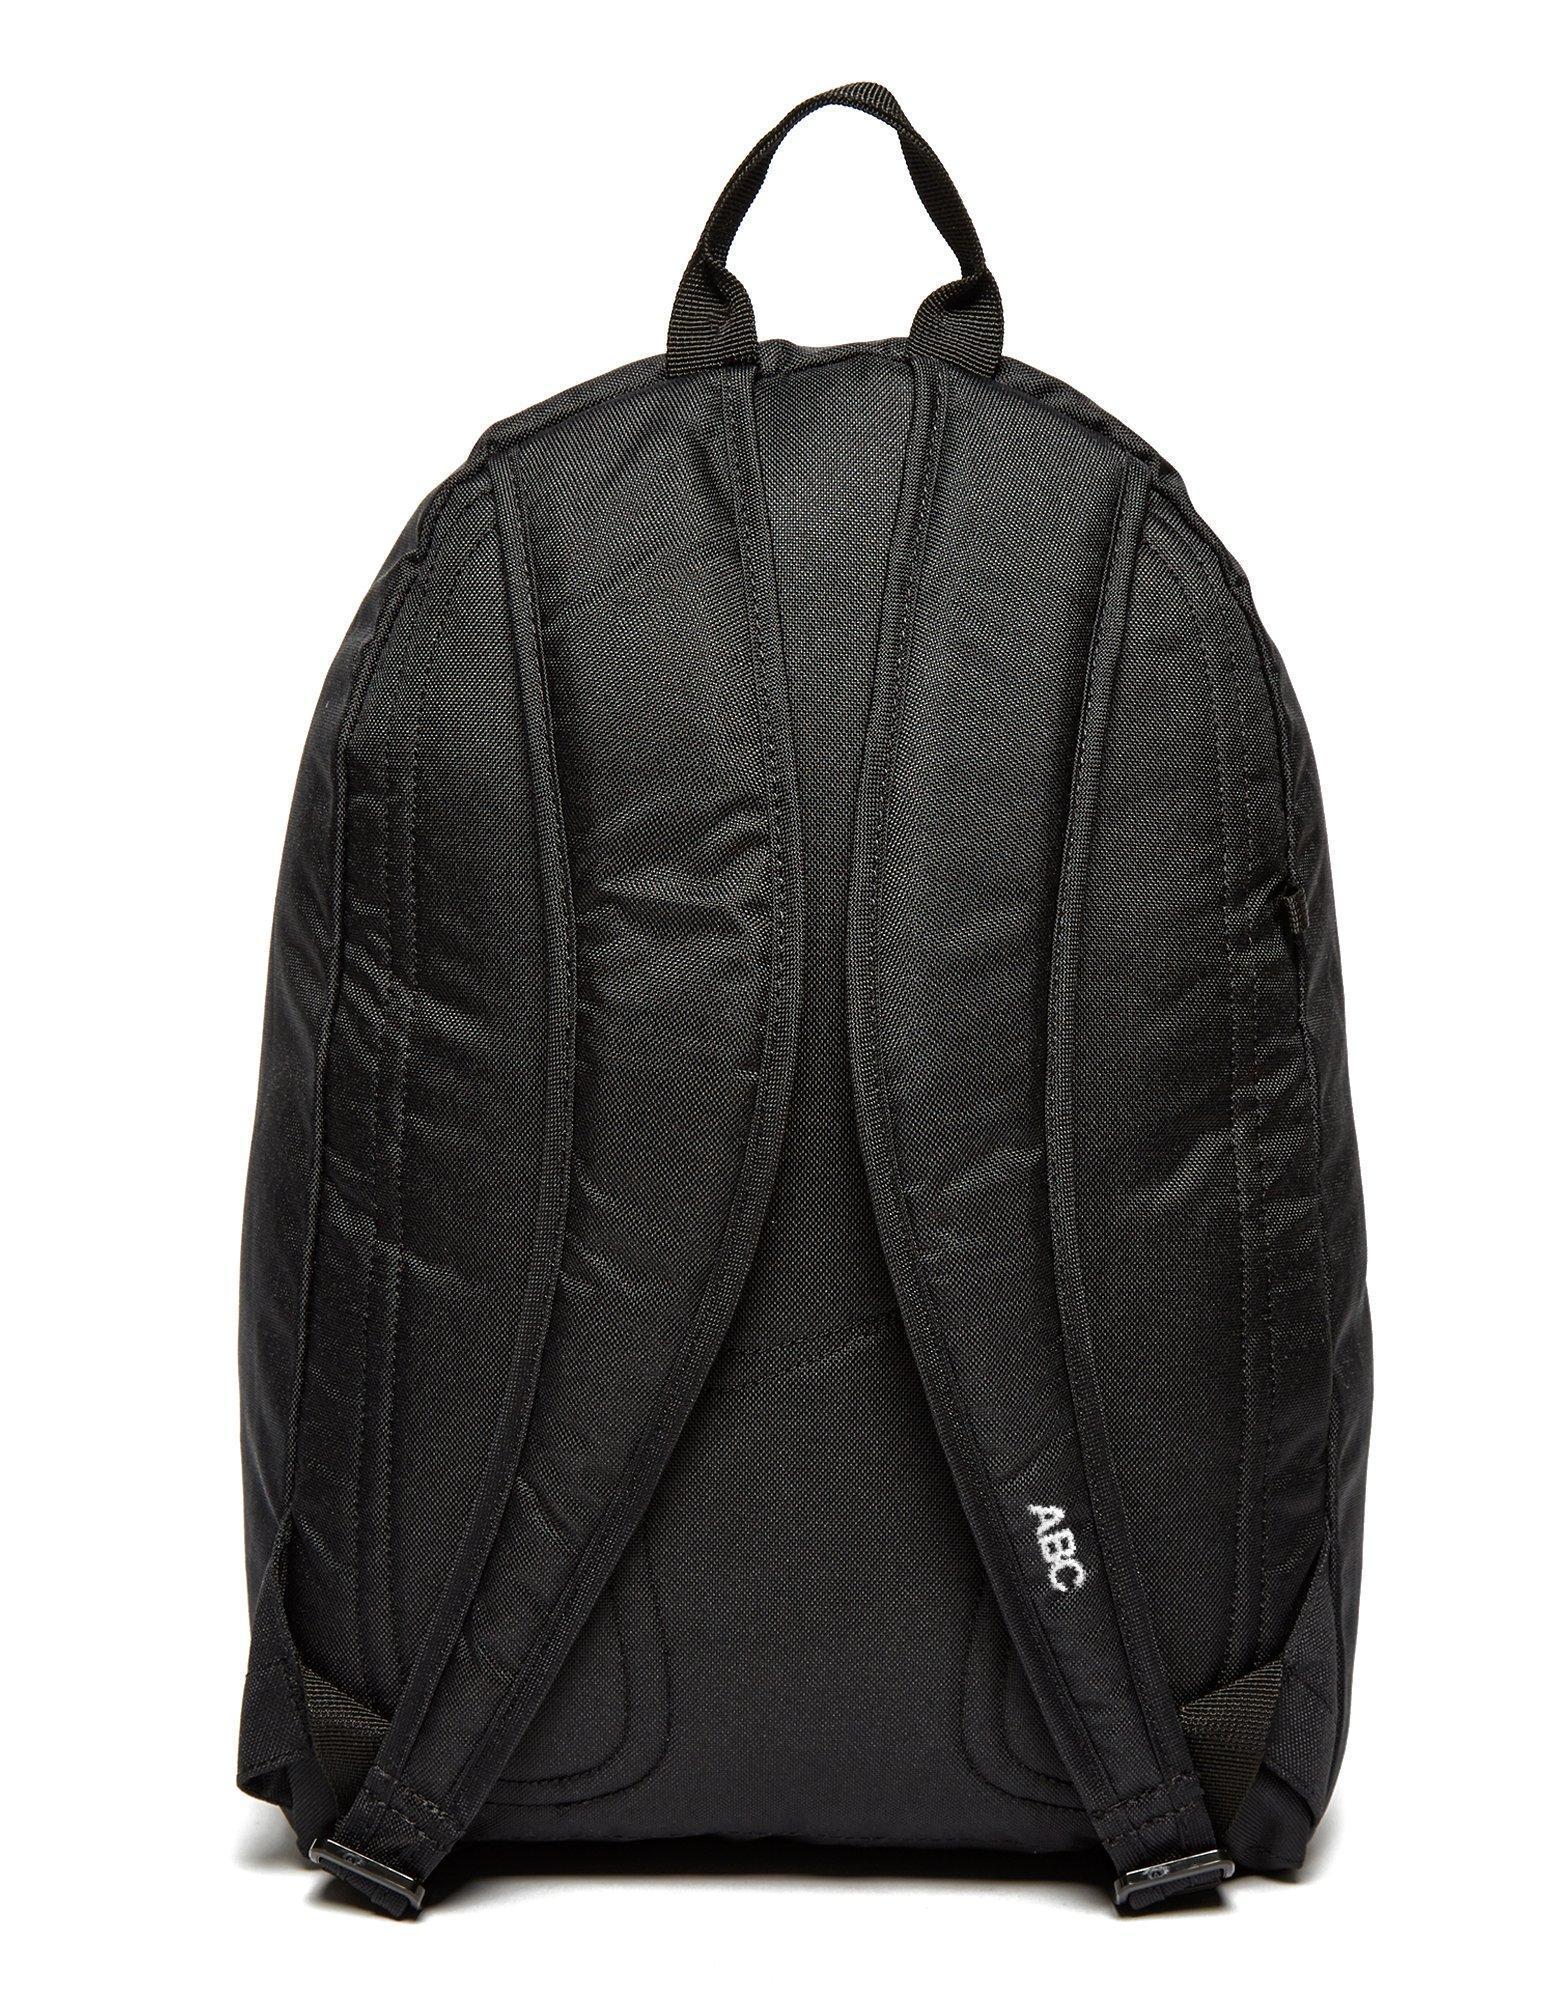 e4f76a9c77 Lyst - Nike Halfday Backpack in Black for Men